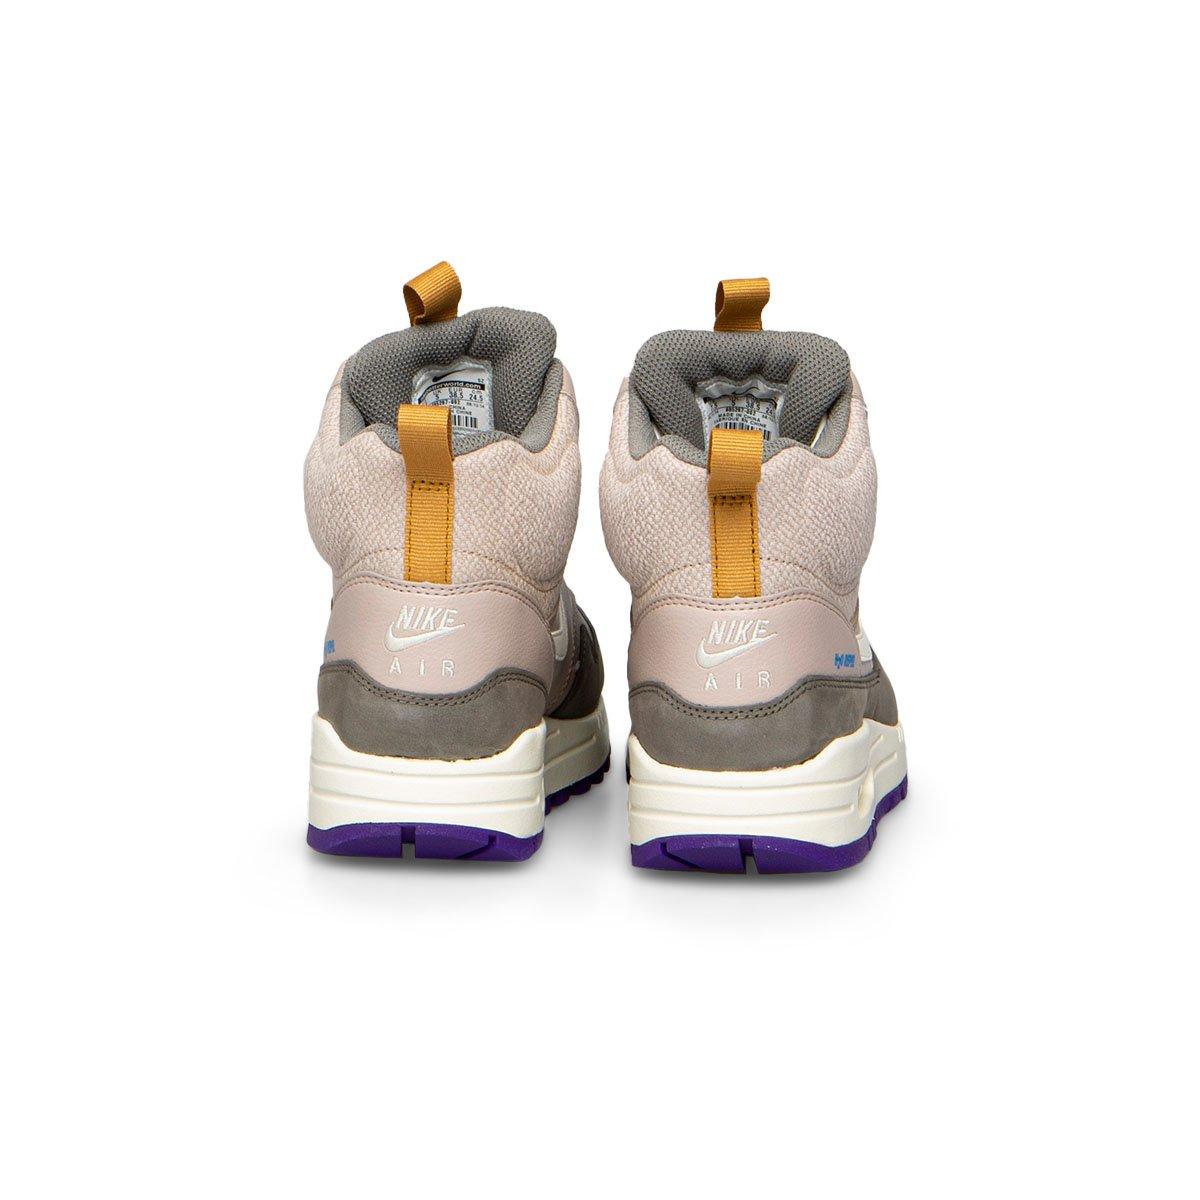 8cfc9b27e4306 ... Sneakers Nike WMNS Air Max 1 white   midnight navy (319986-116) ...